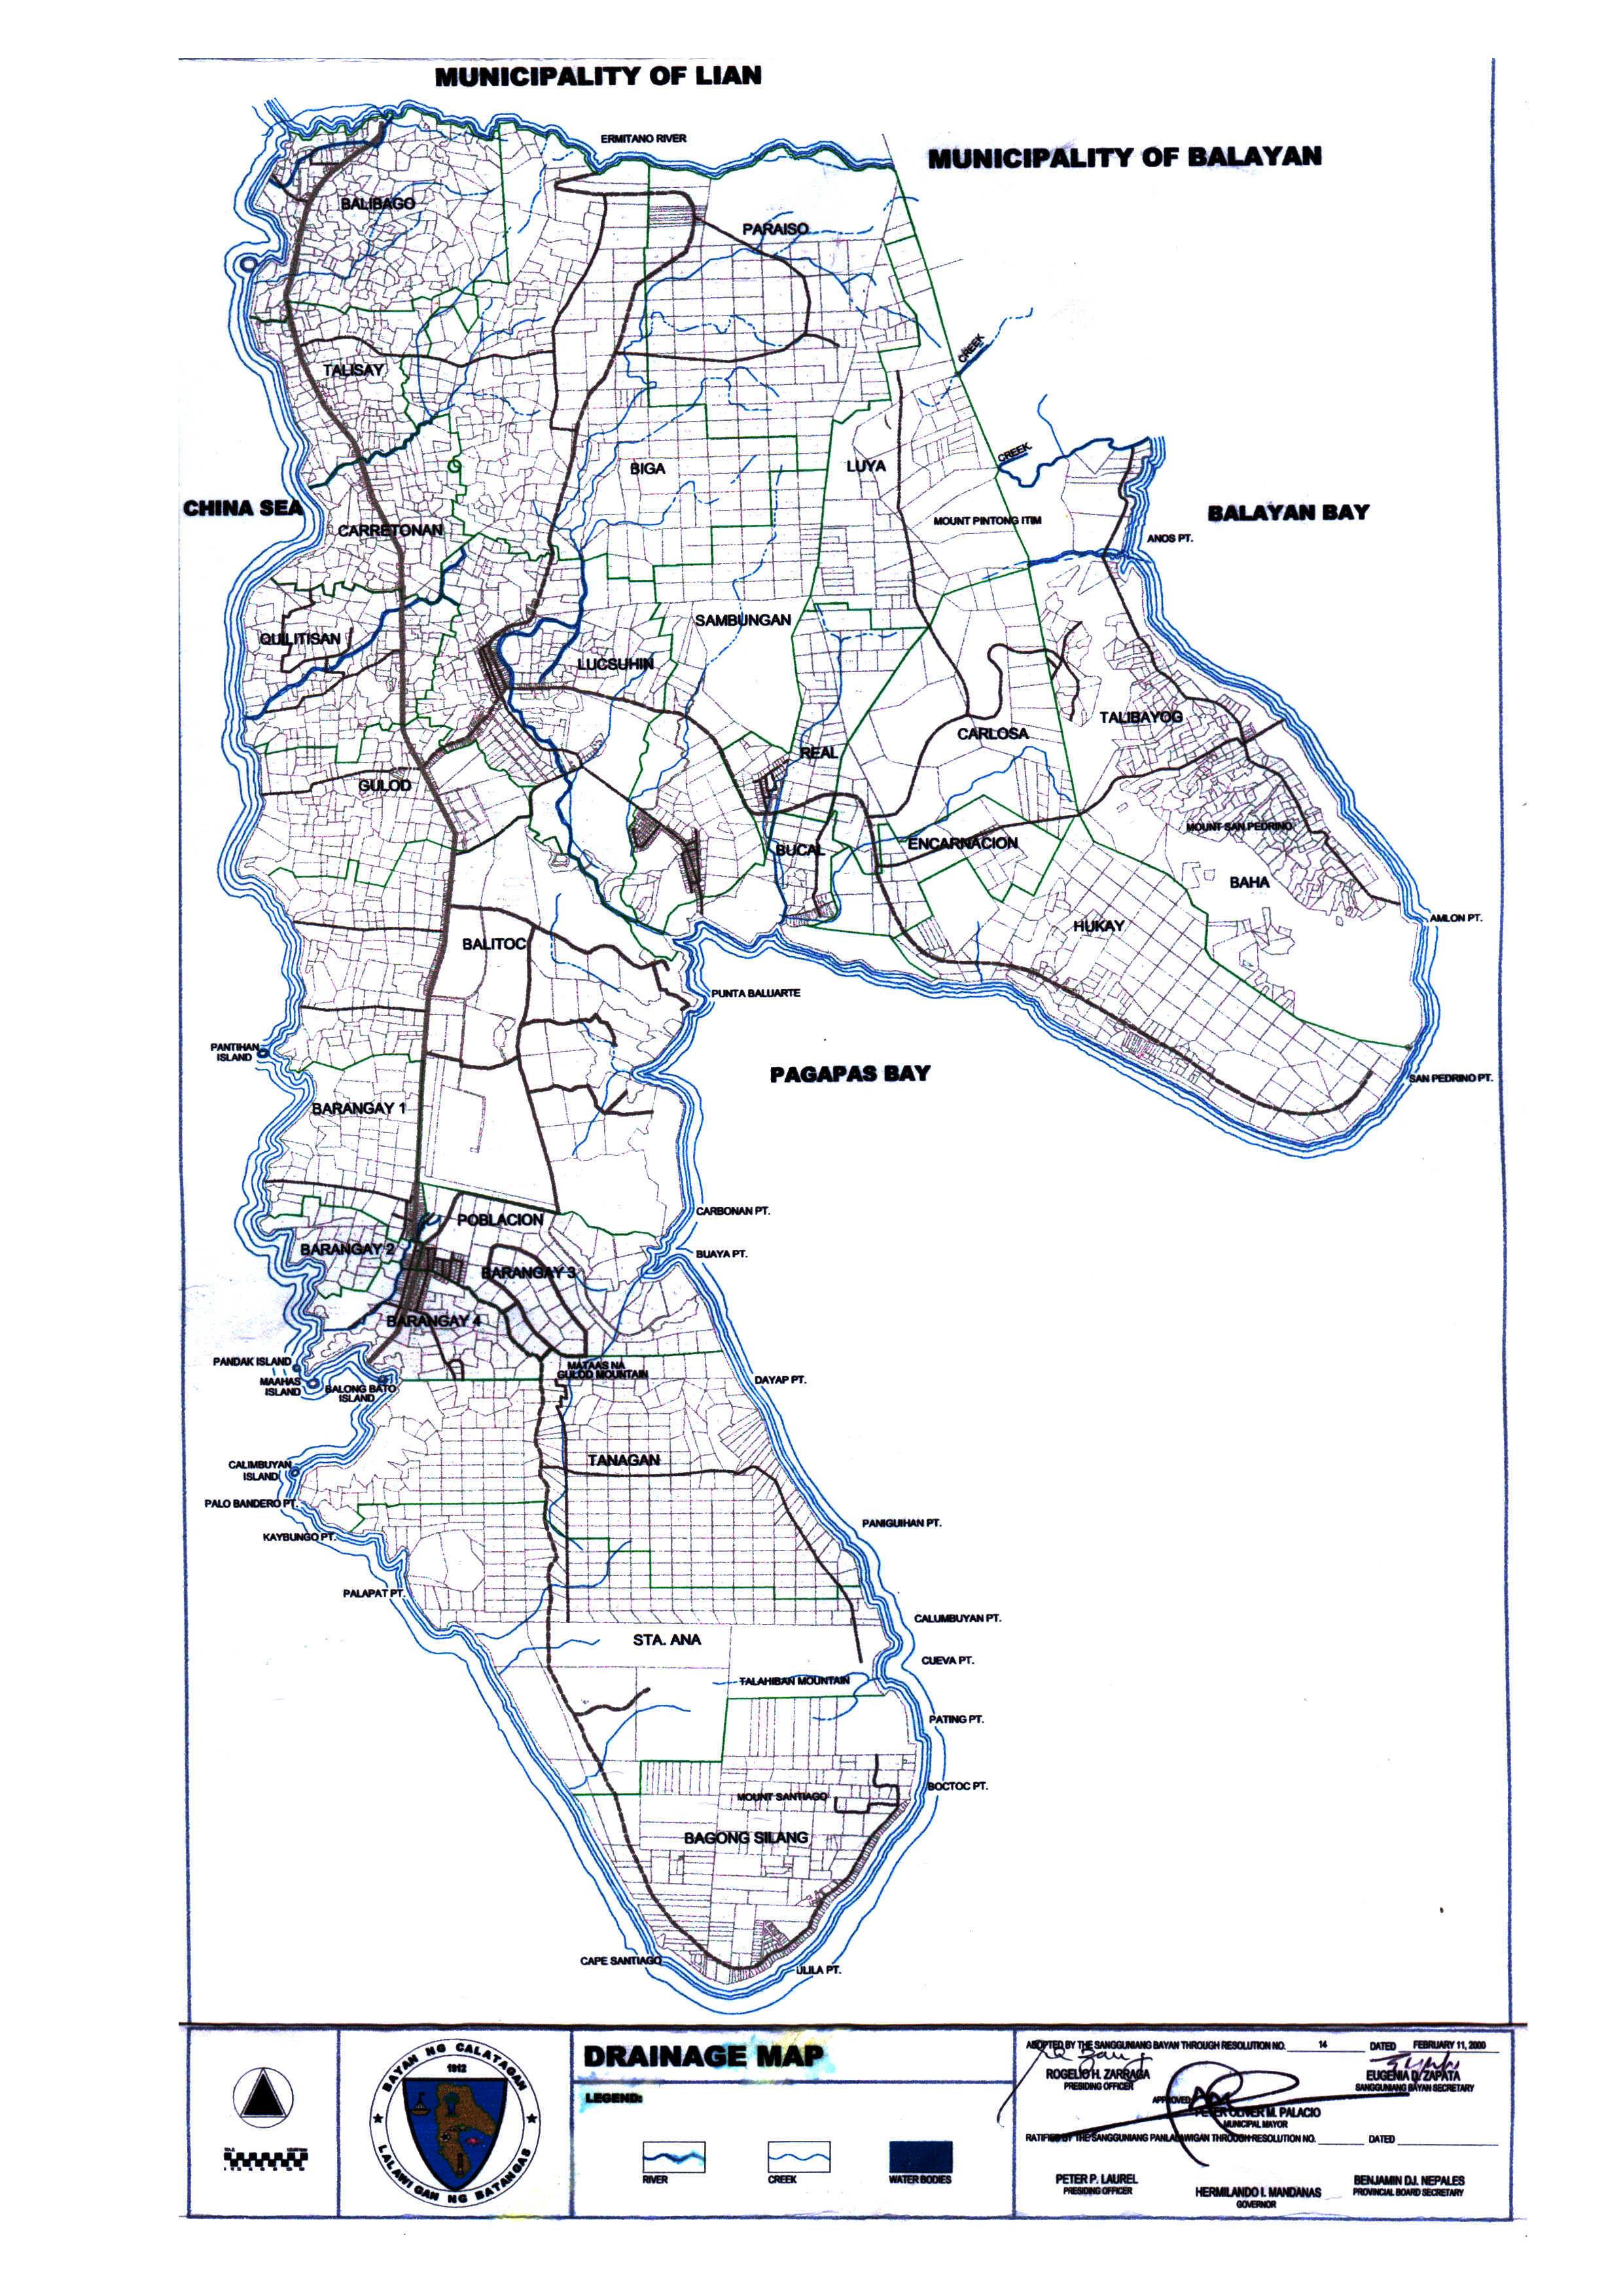 drainage map